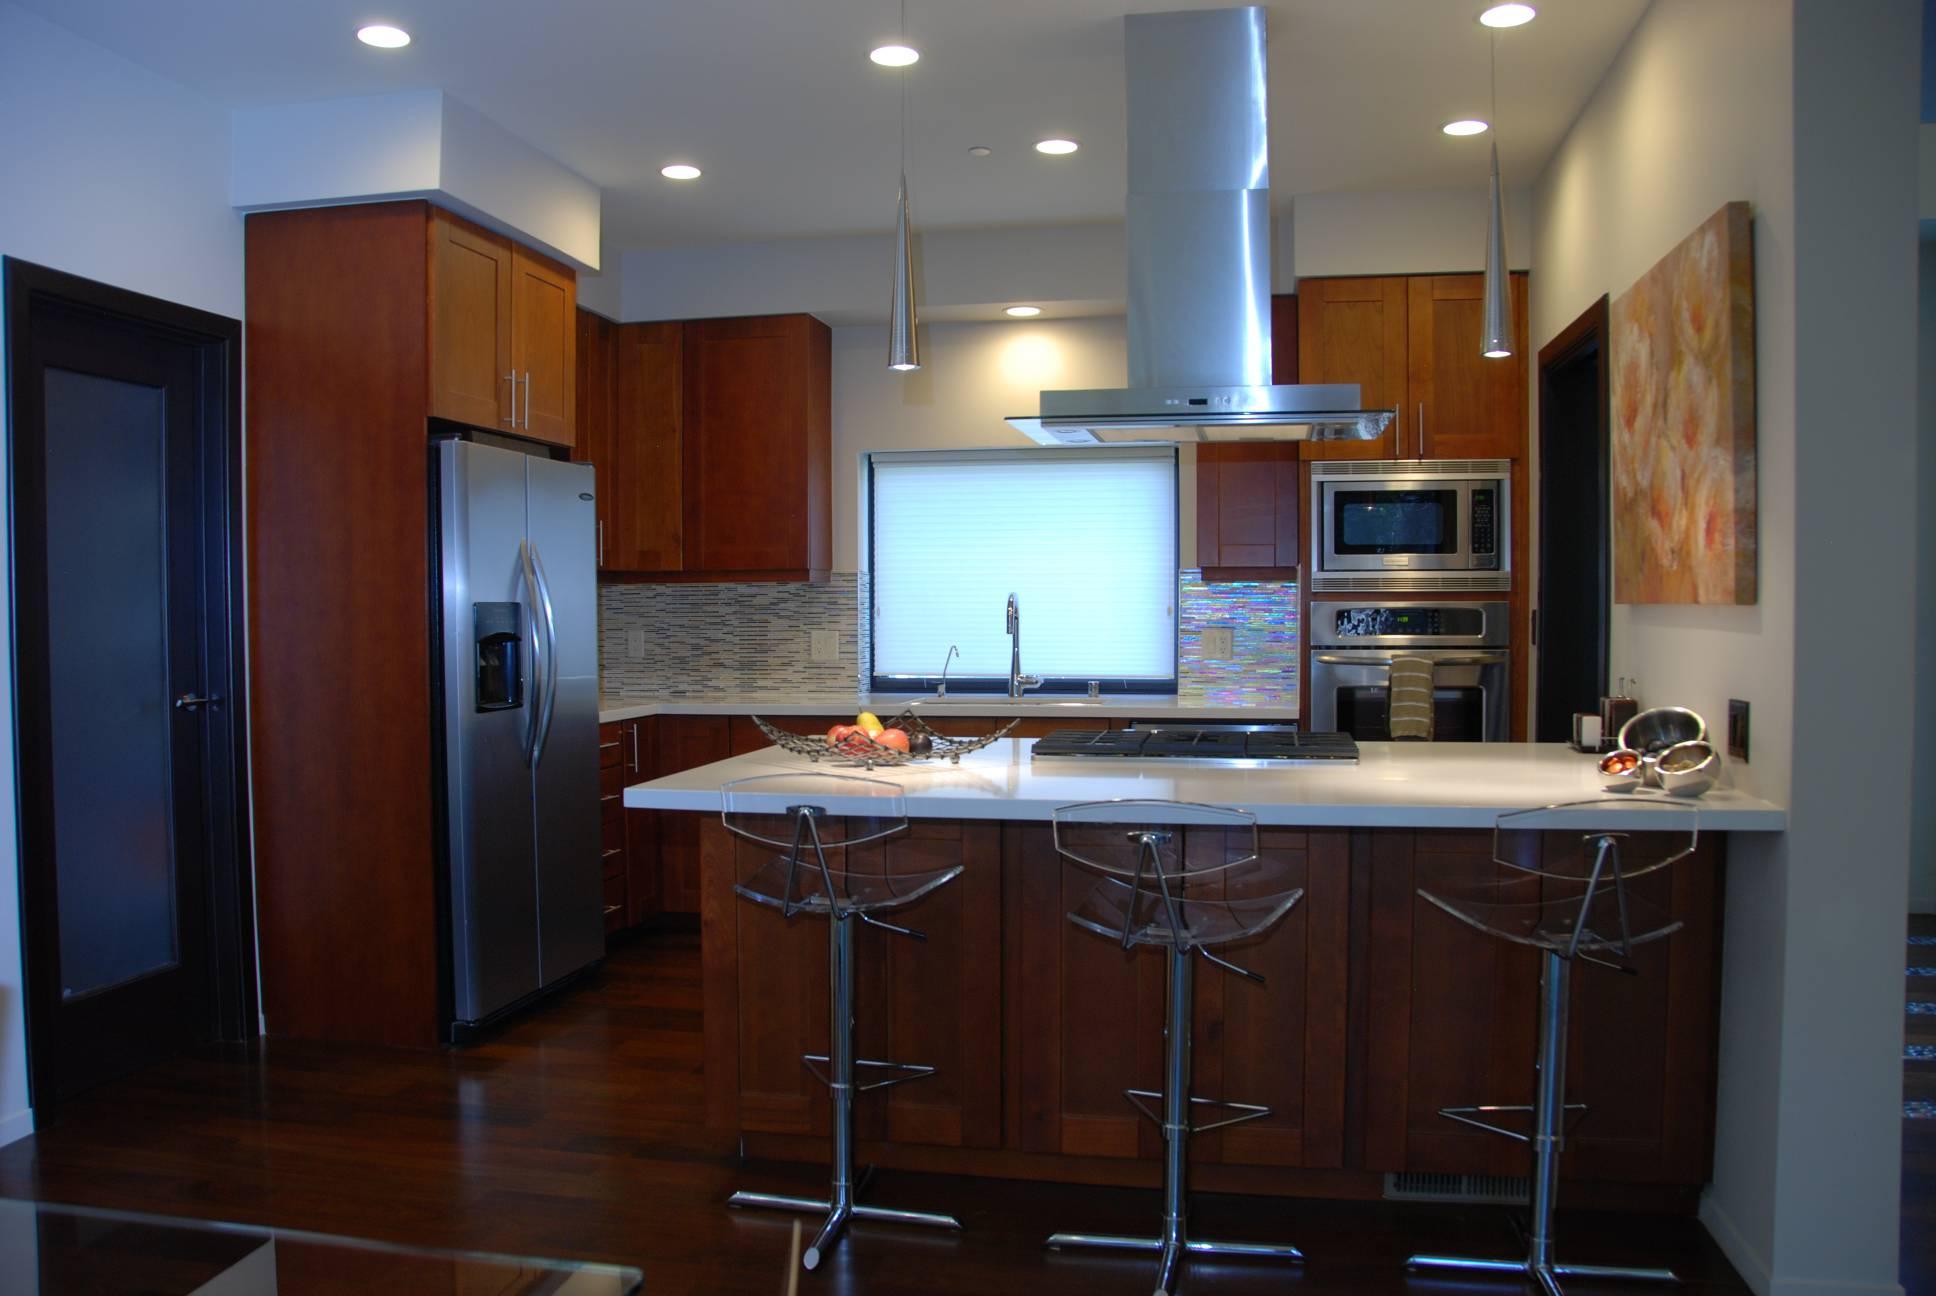 Kitchen with White Countertops, interior design work, architect design, Los Altos